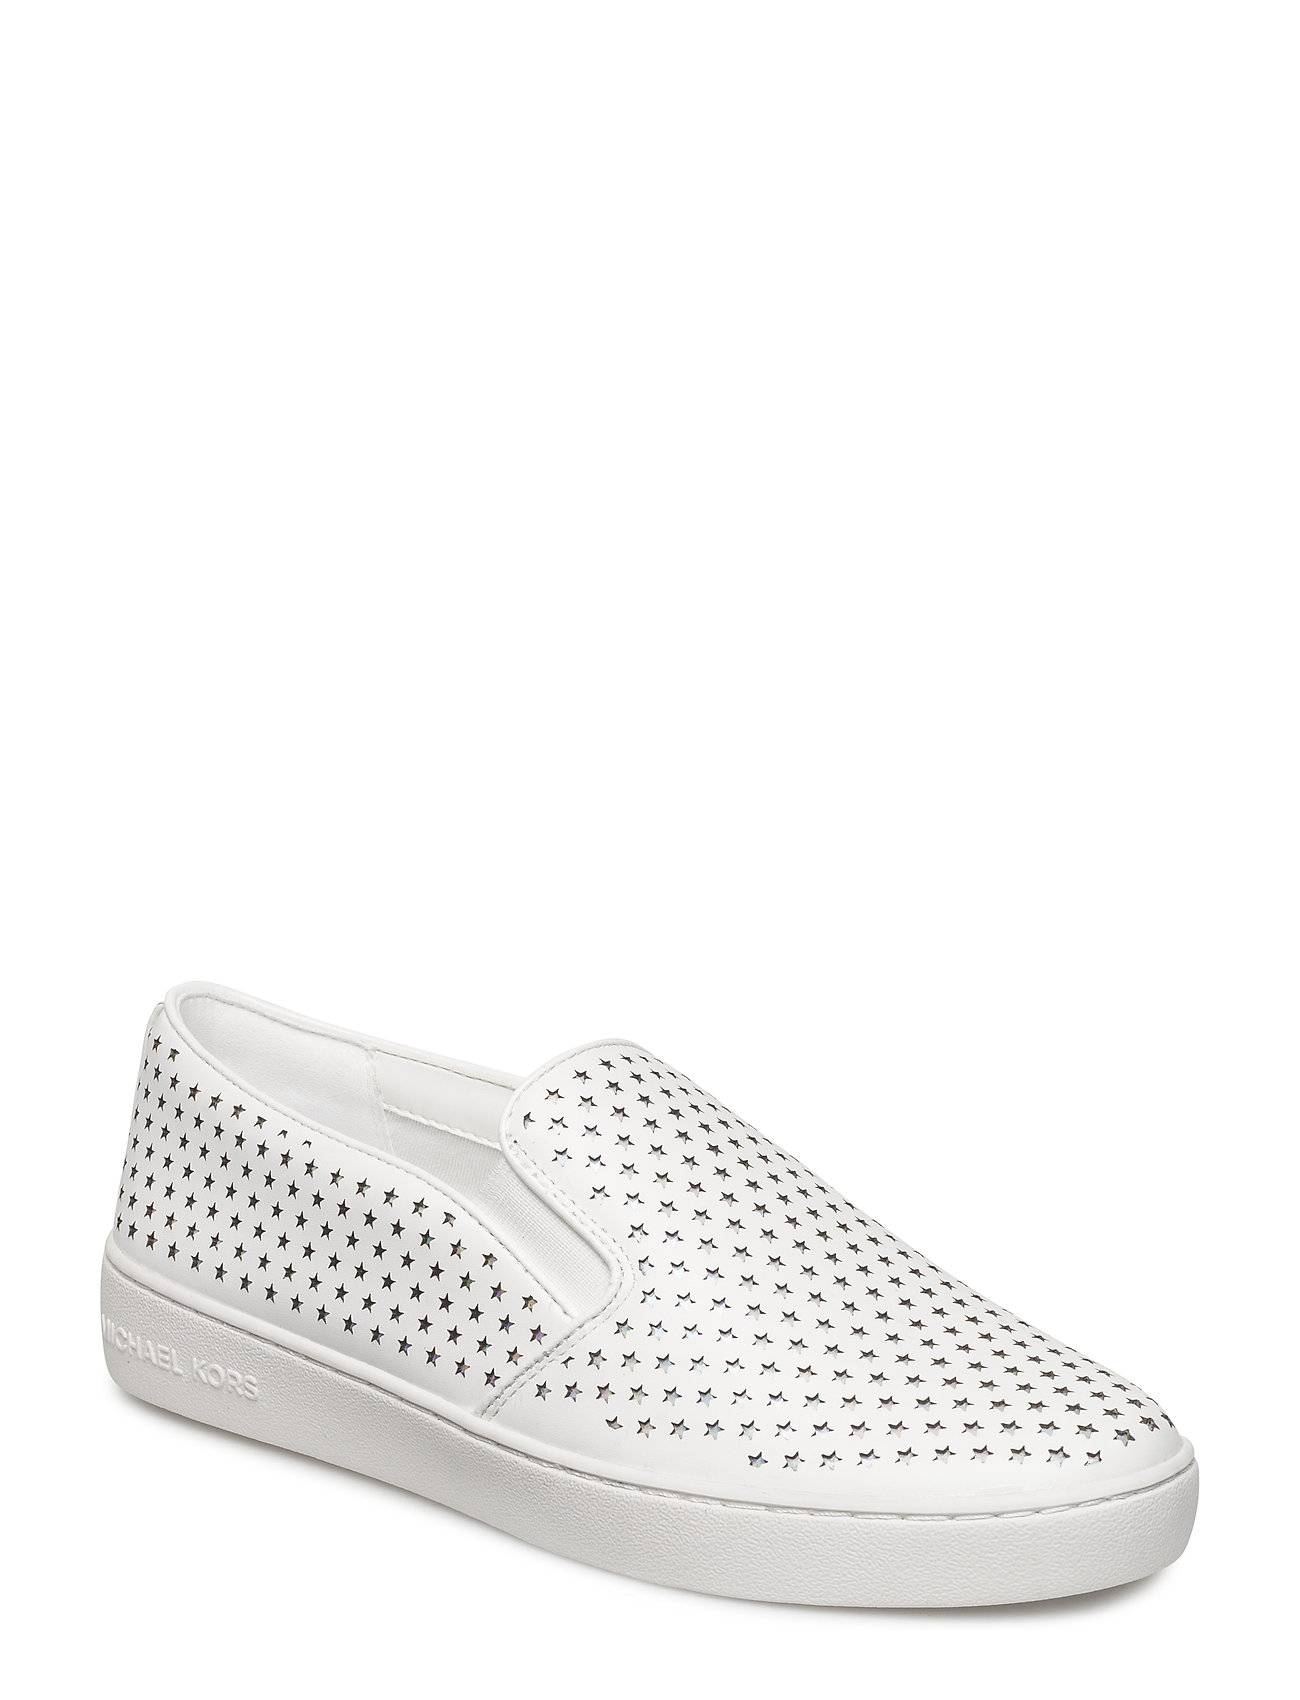 Michael Kors Shoes Keaton Slip On